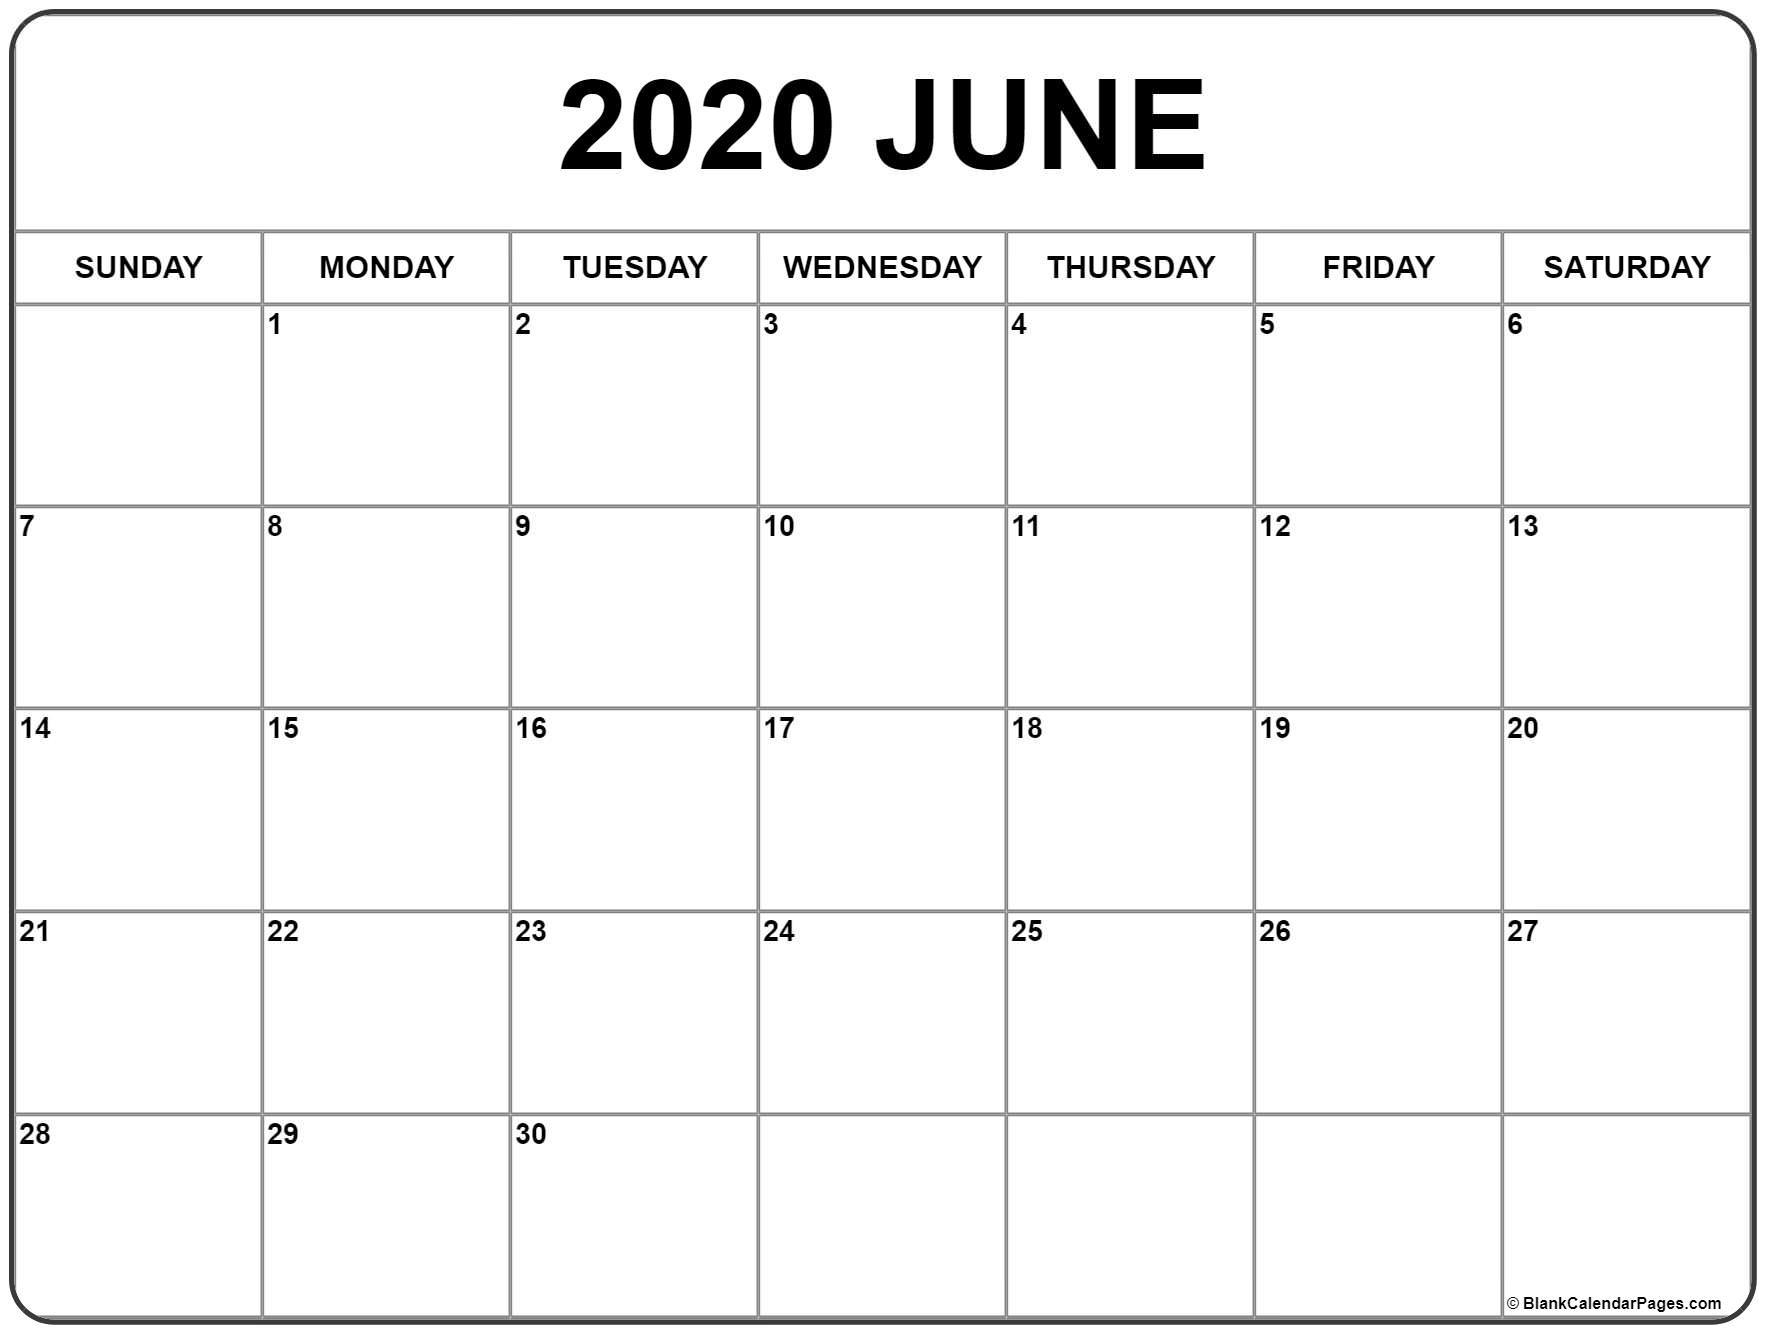 June 2020 Calendar | Free Printable Monthly Calendars Christmas Calendar 2020 Printable Free